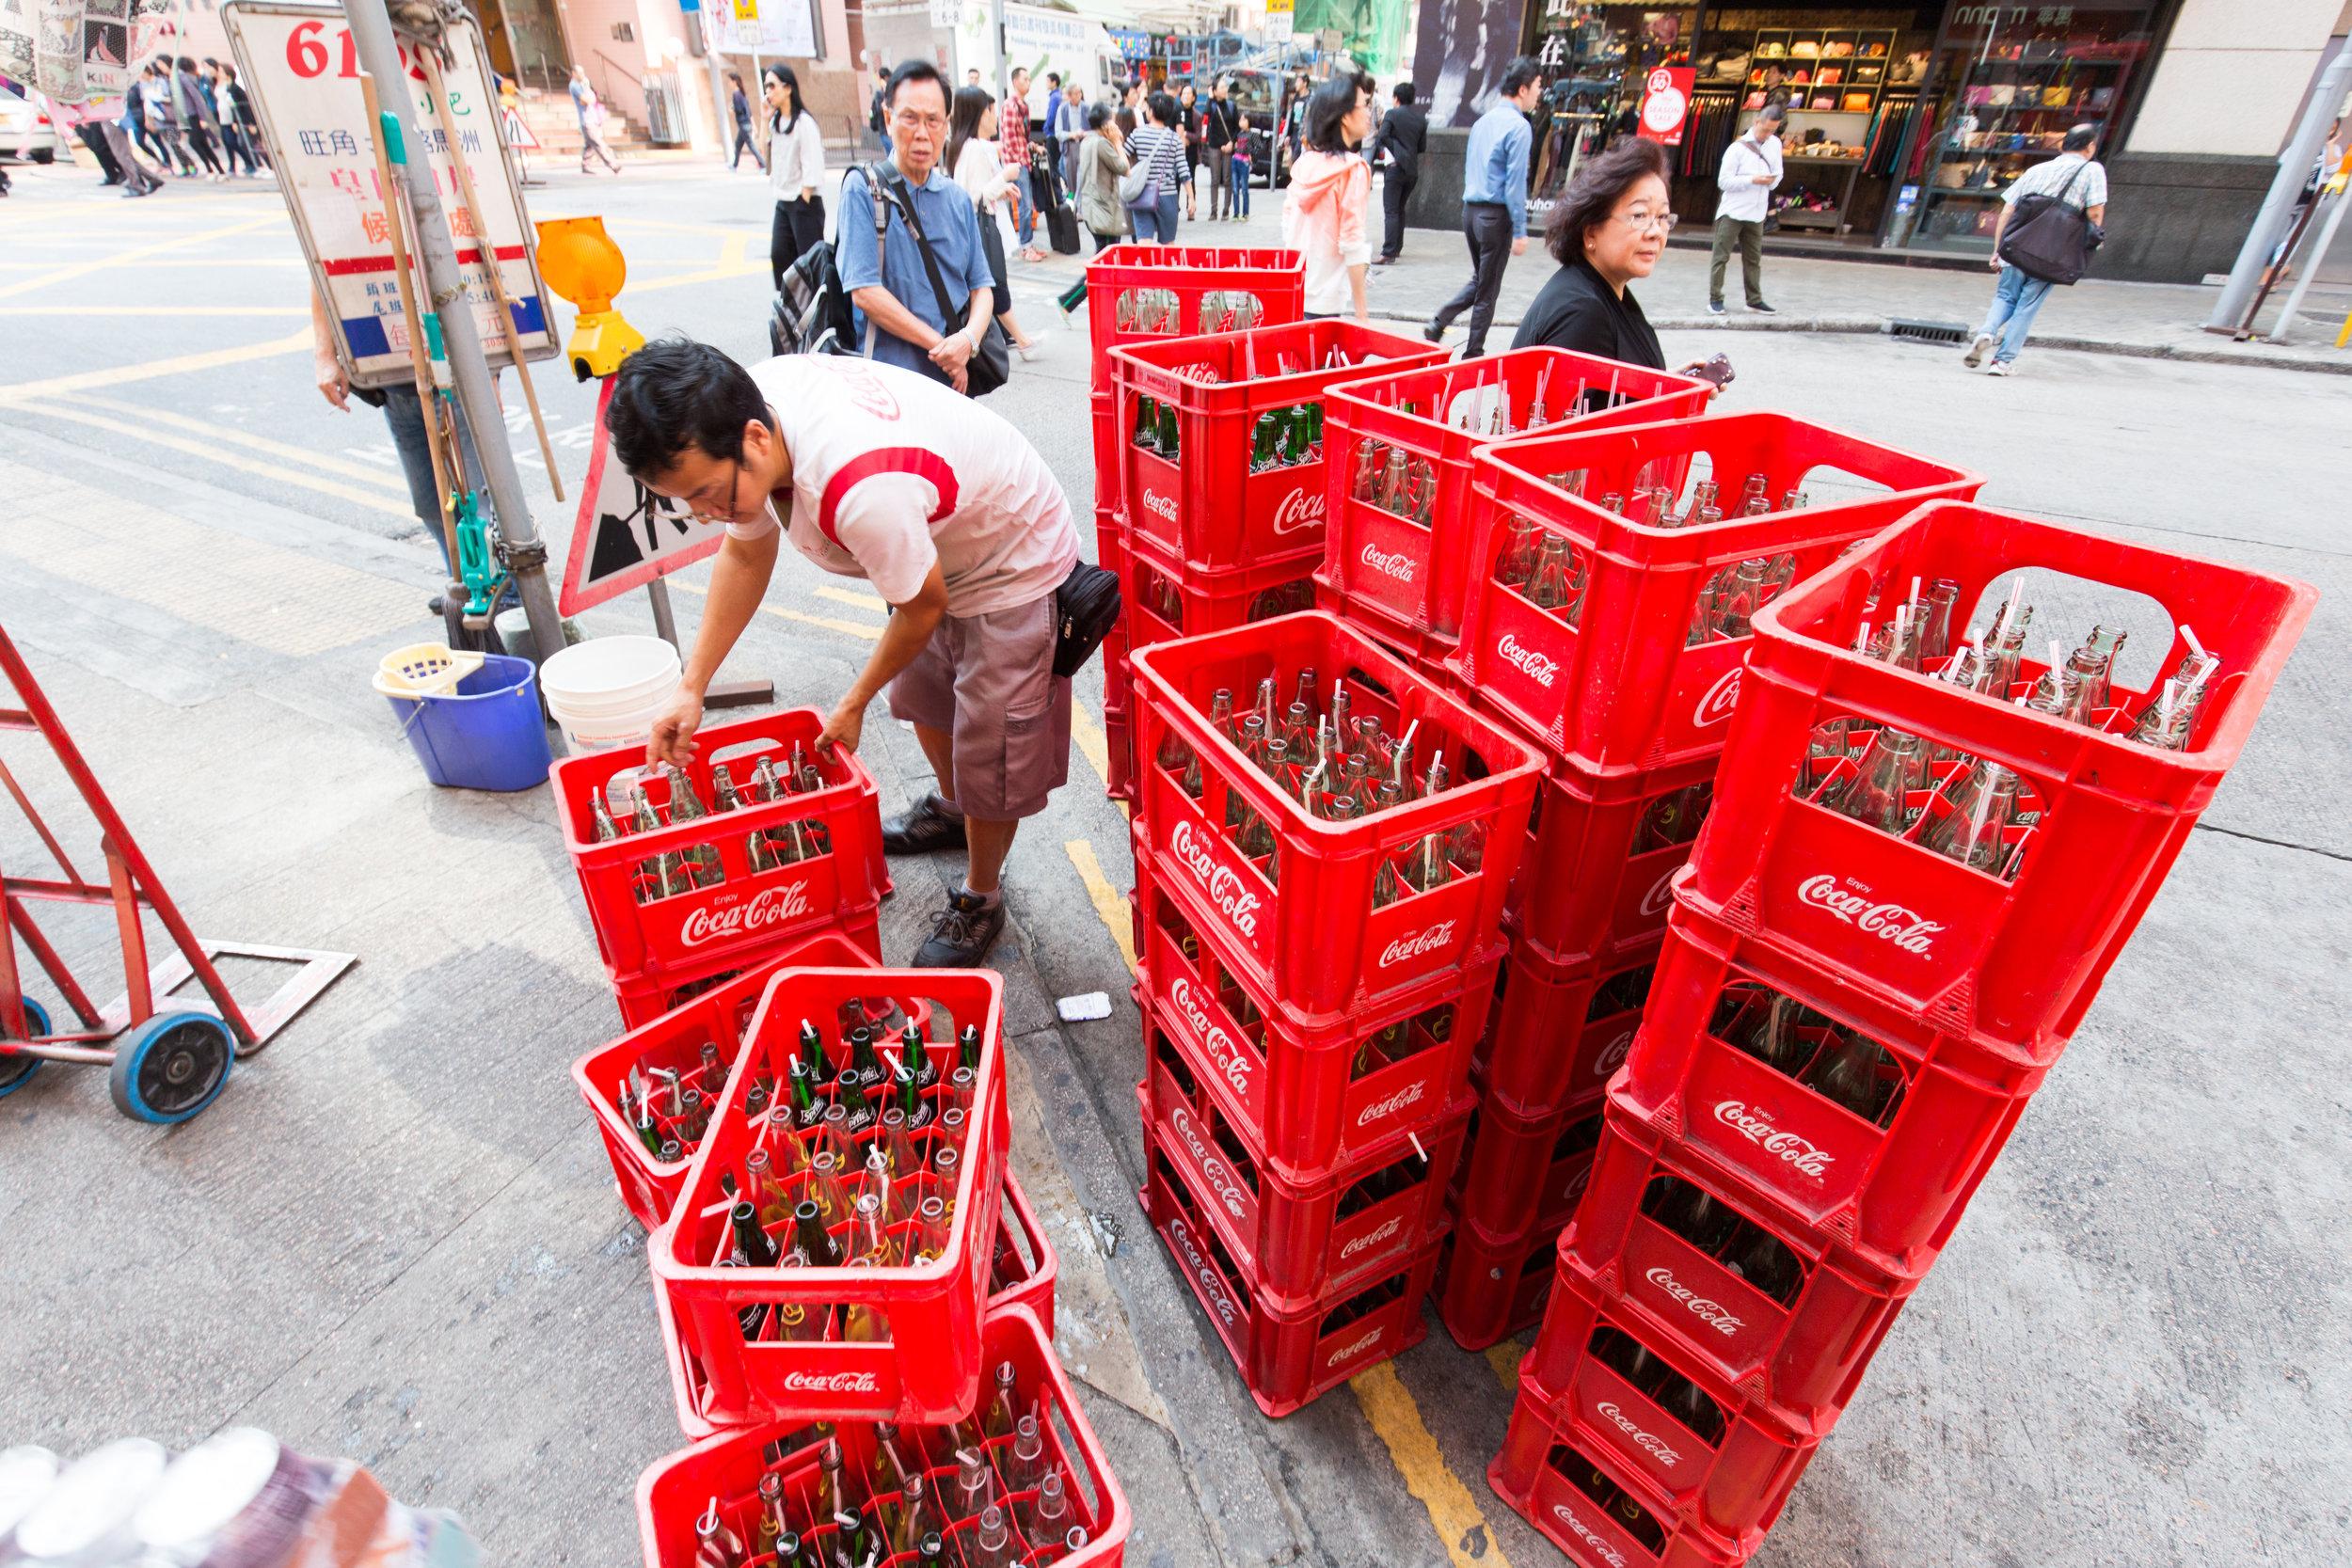 A man picks up empties in Mongkok, Hong Kong